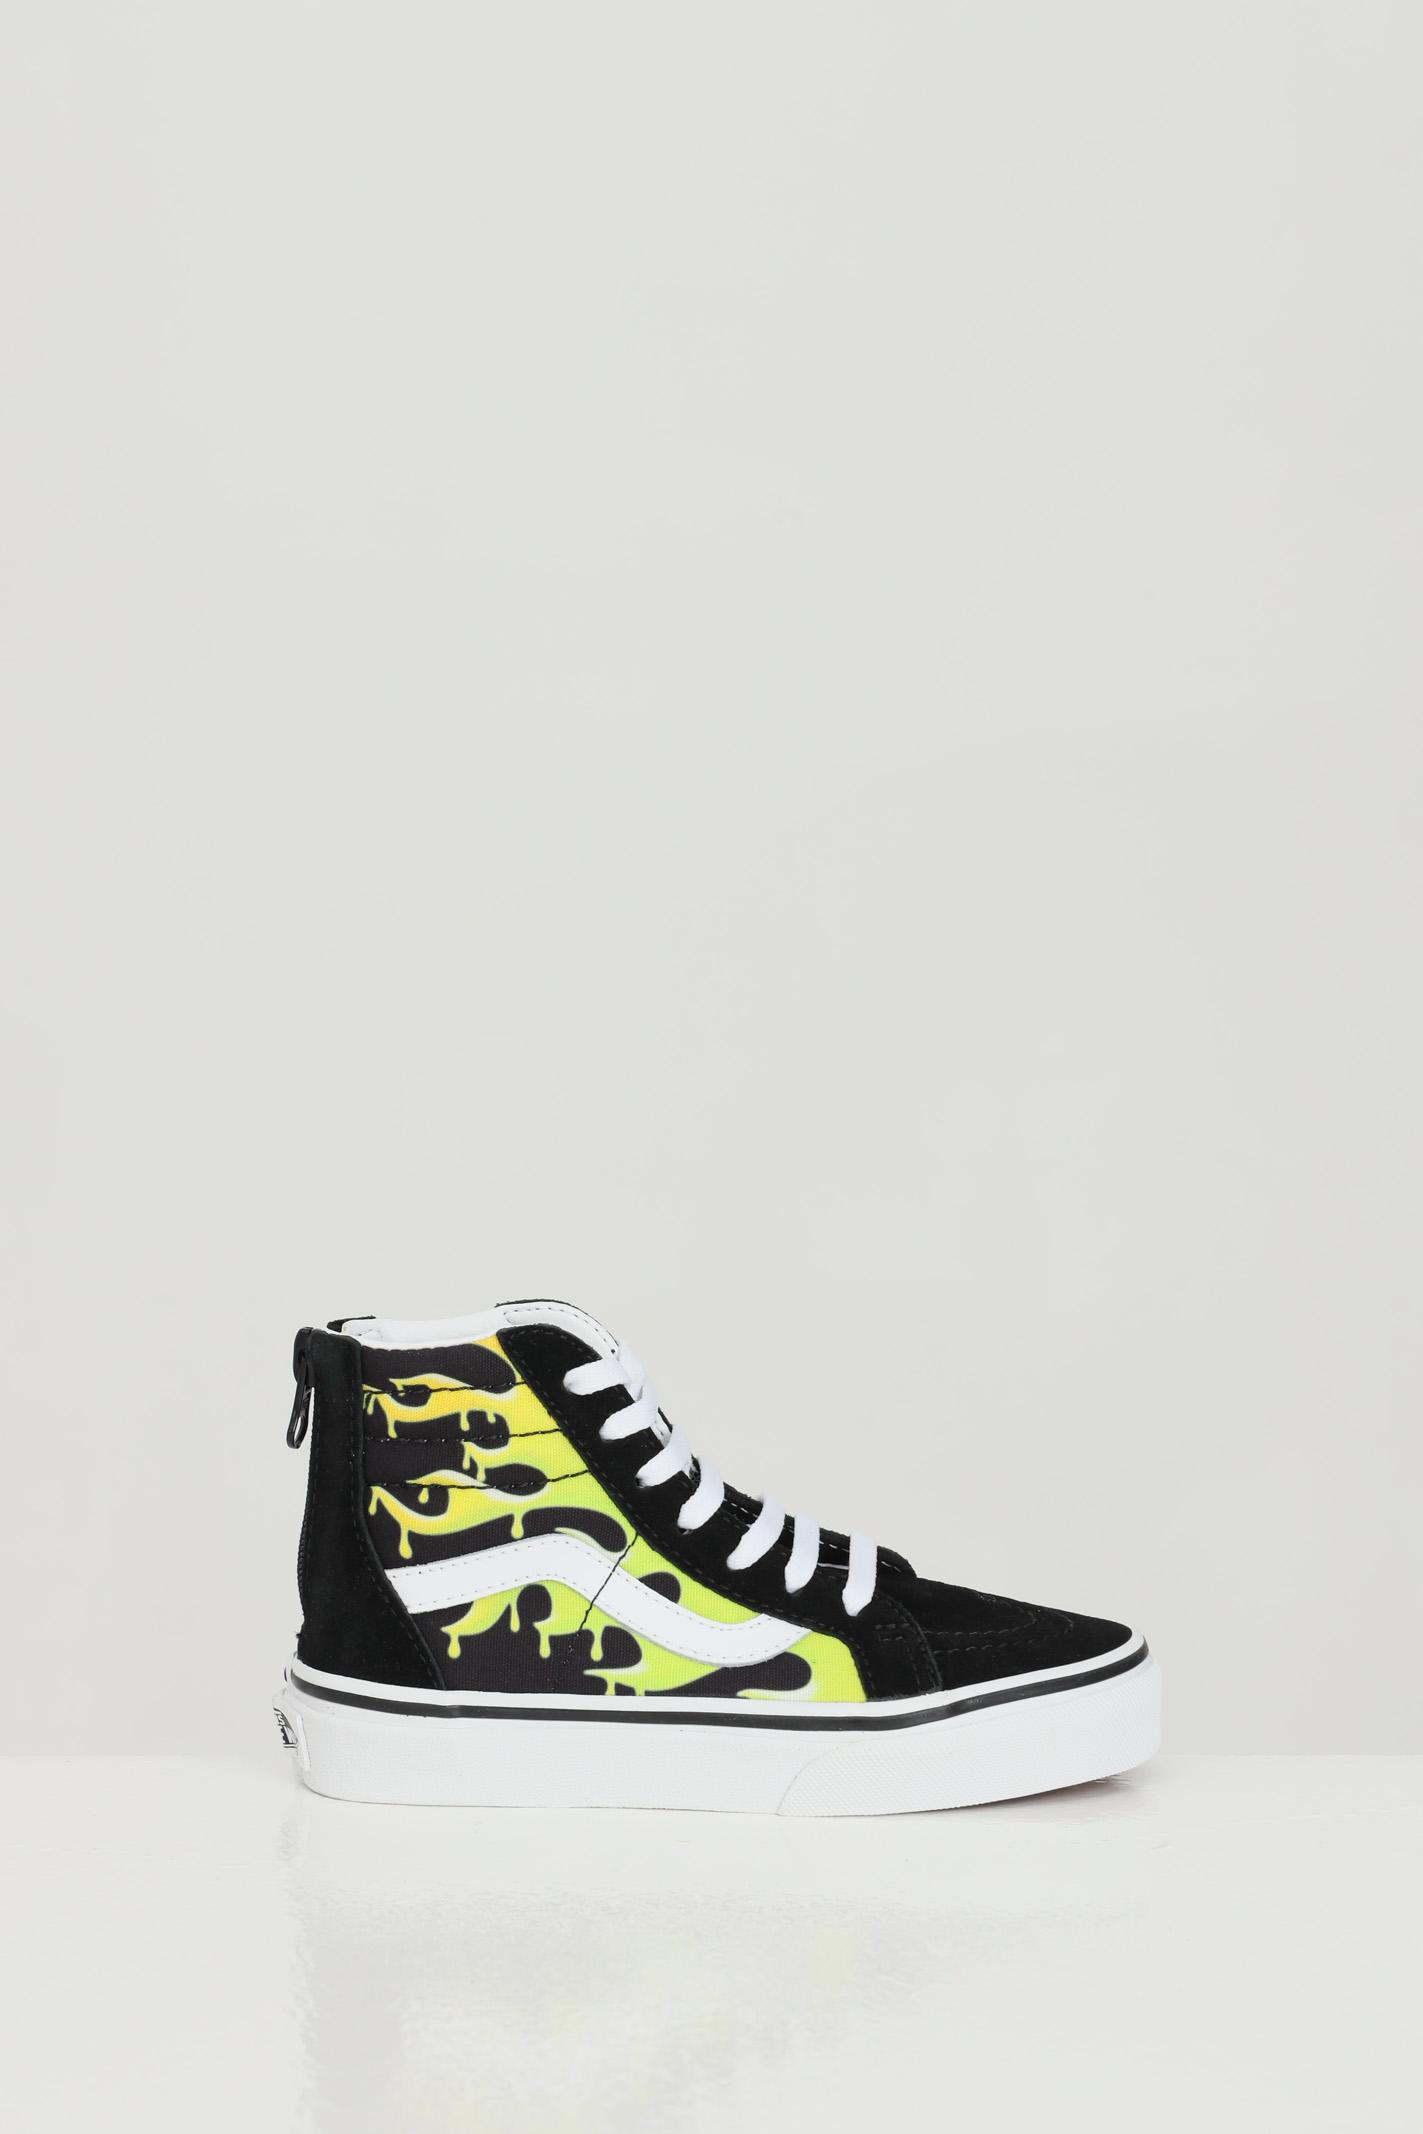 Sneakers slime flame sk8-hi bambino unisex nero vans modello a stivaletto stampa fiamme